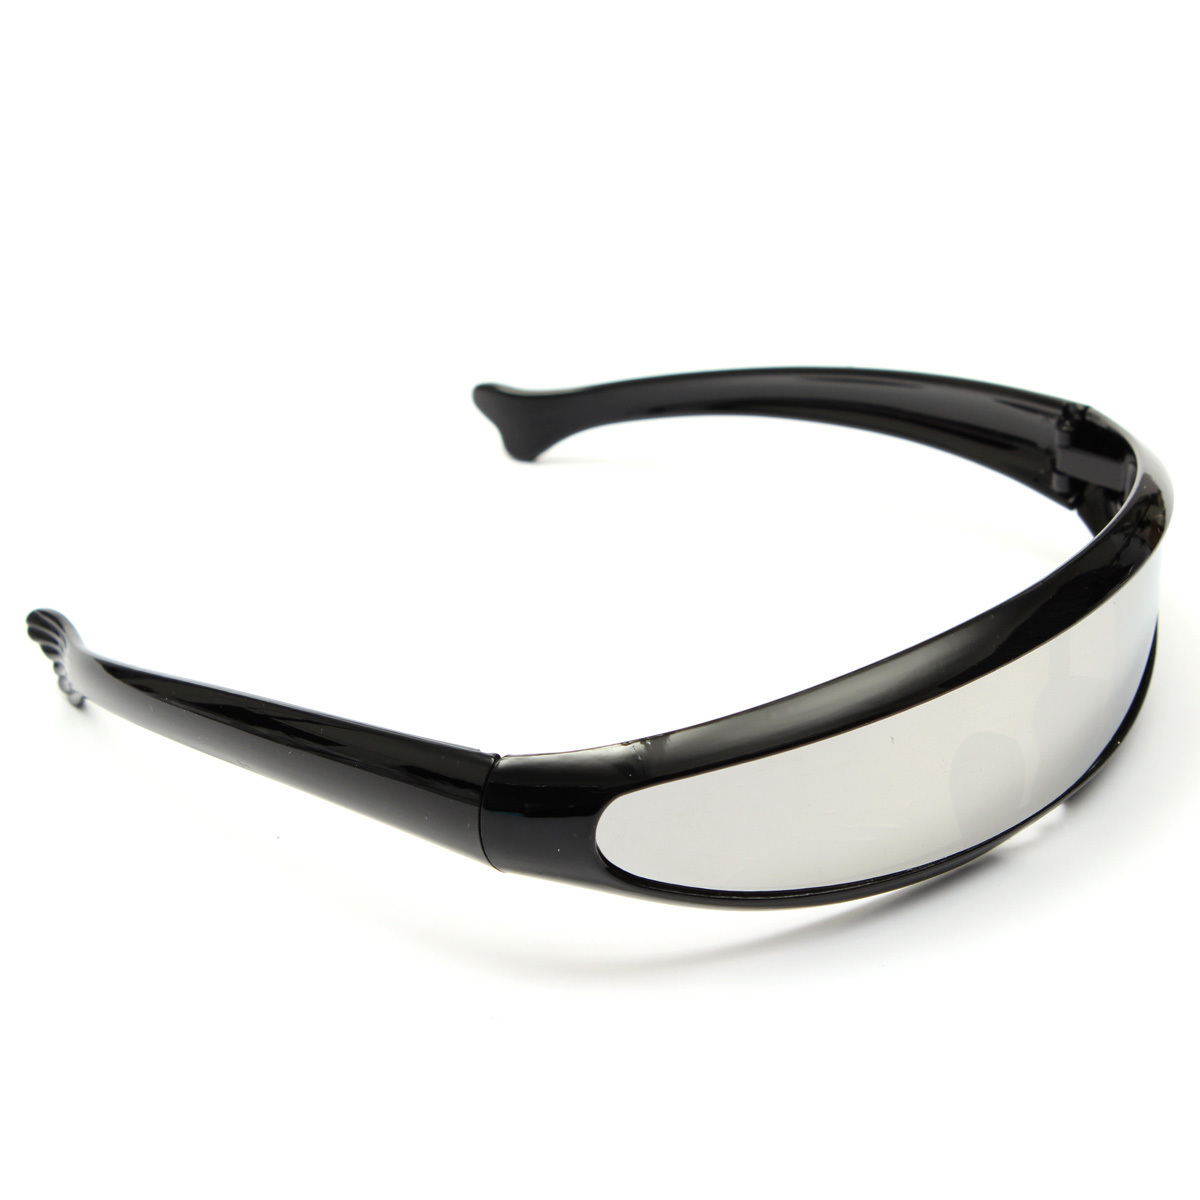 Beli Kacamata Hitam Bermata Sunnies Cermin Ruang Gelap Robot Perisai Kostum Makhluk Asing